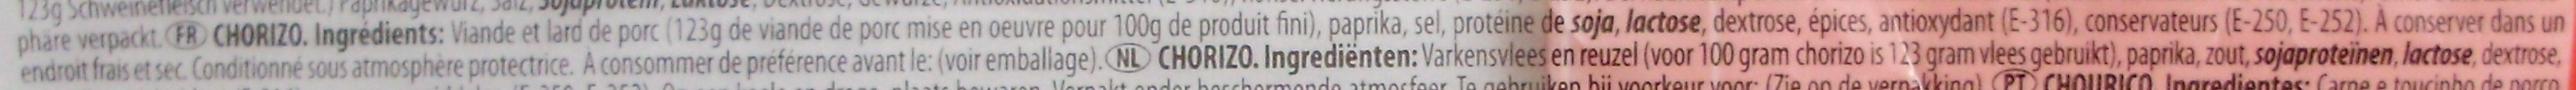 Chorizo Fort Pikant - Ingrédients - fr